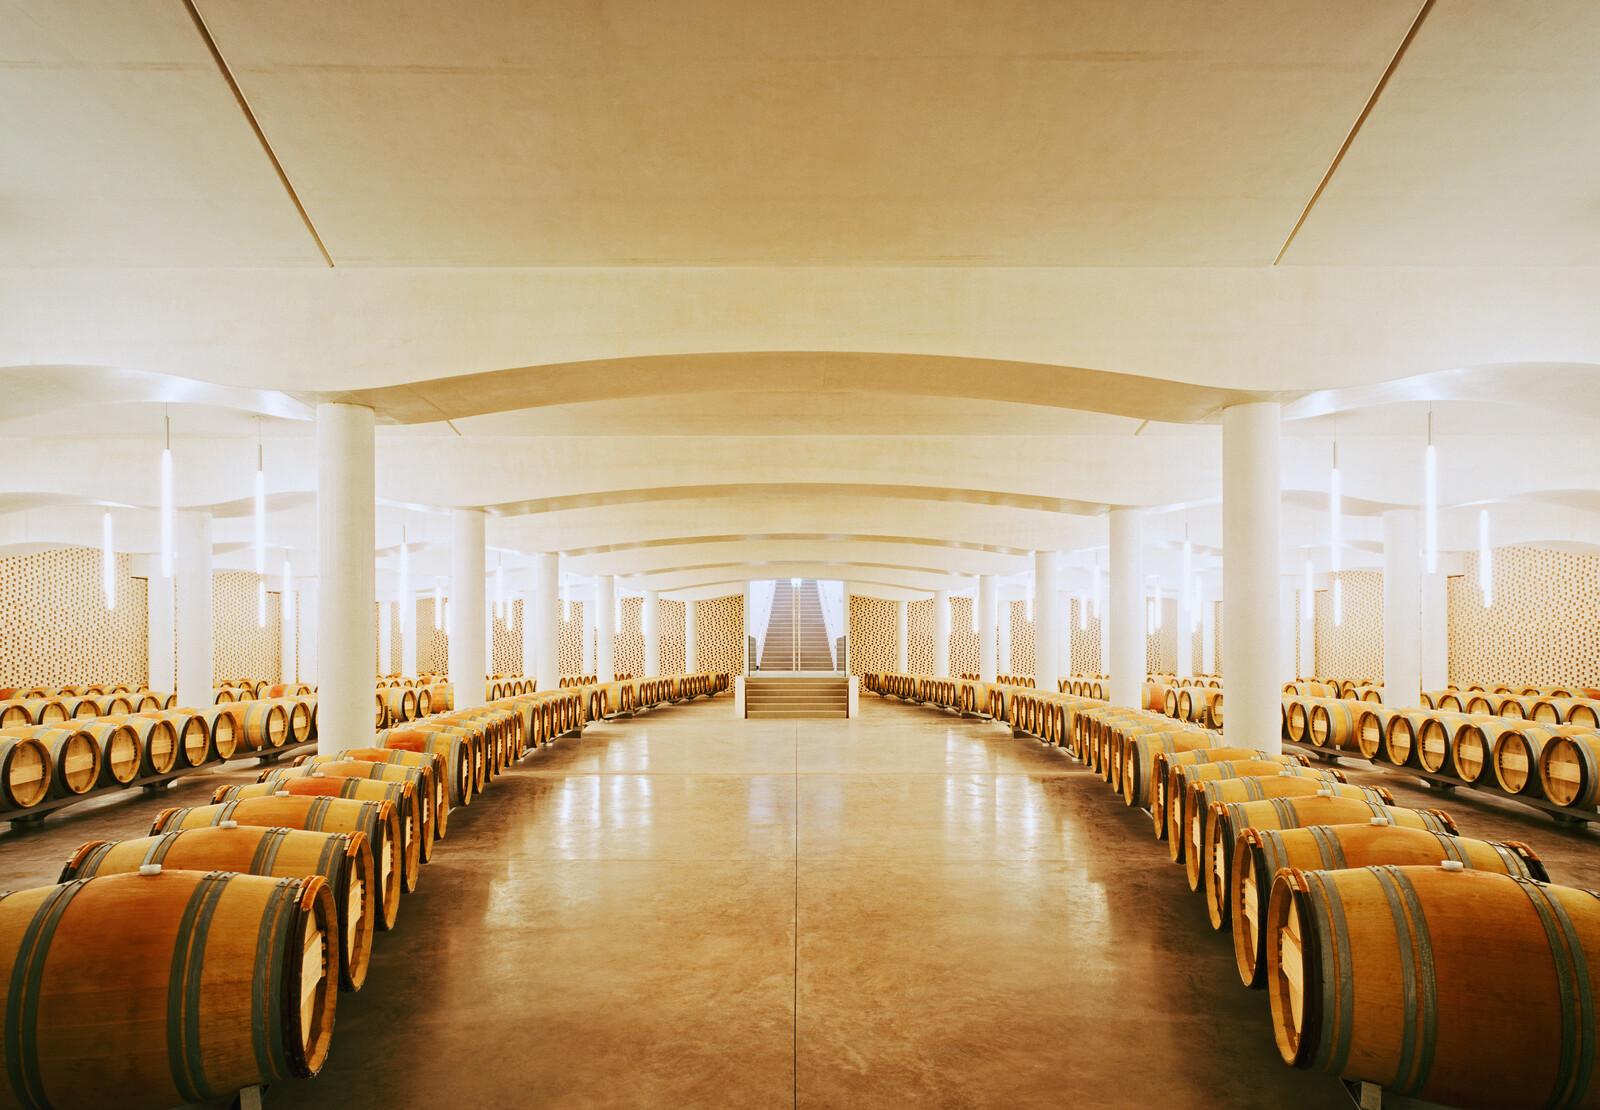 Chateau Cheval Blanc, Bordeaux, France - Rafael Neff